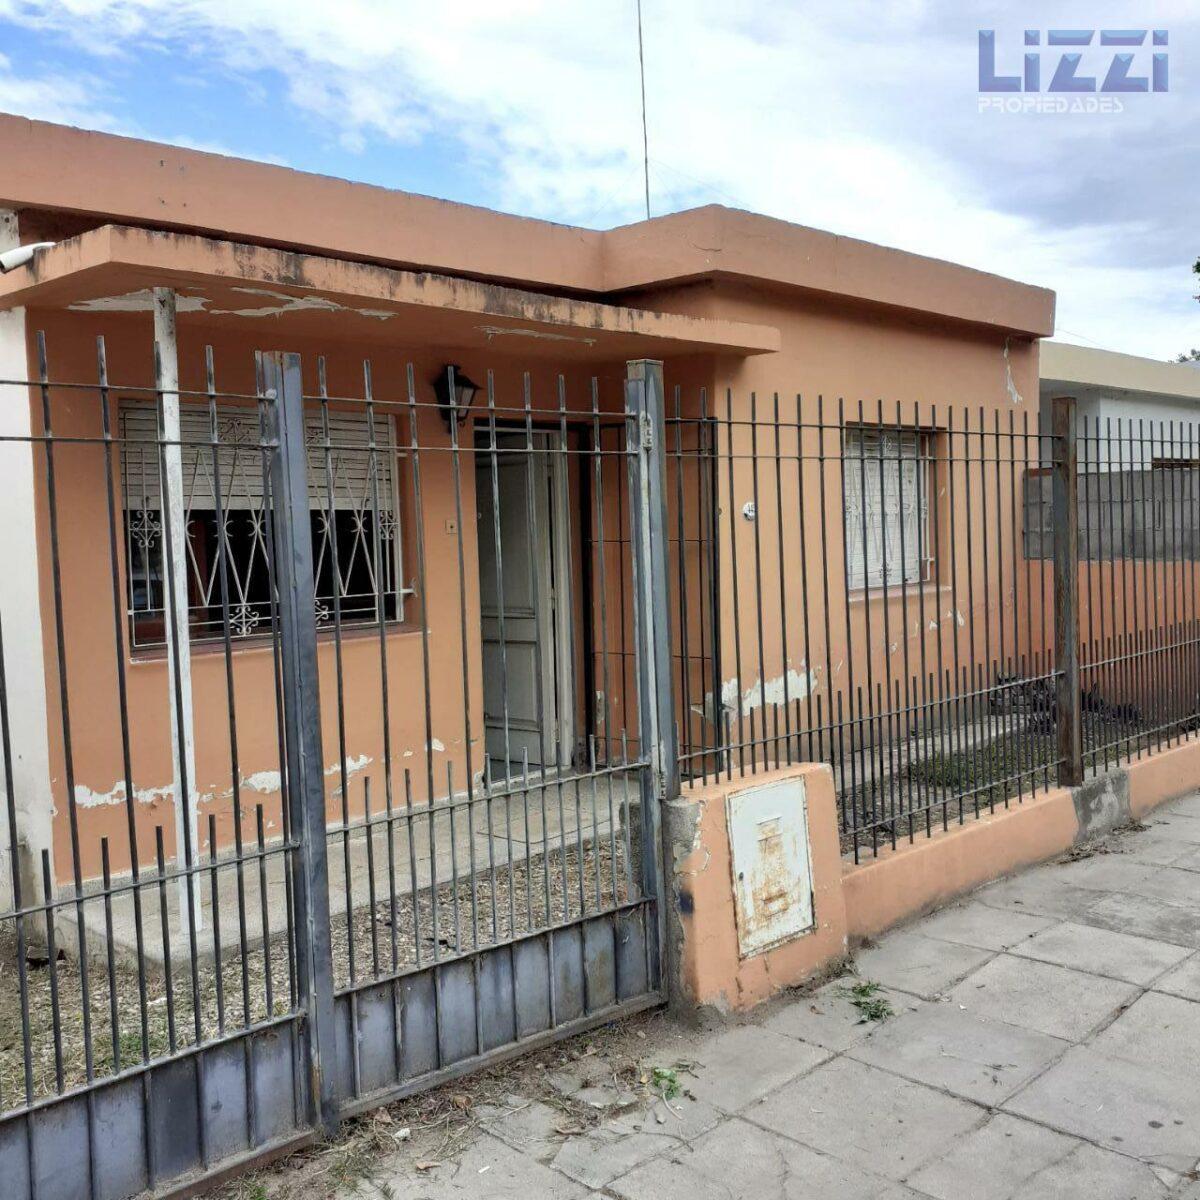 VENTA CASA 2 DORMITORIOS EN CALLE VIENA – BARRIO POLUYAN